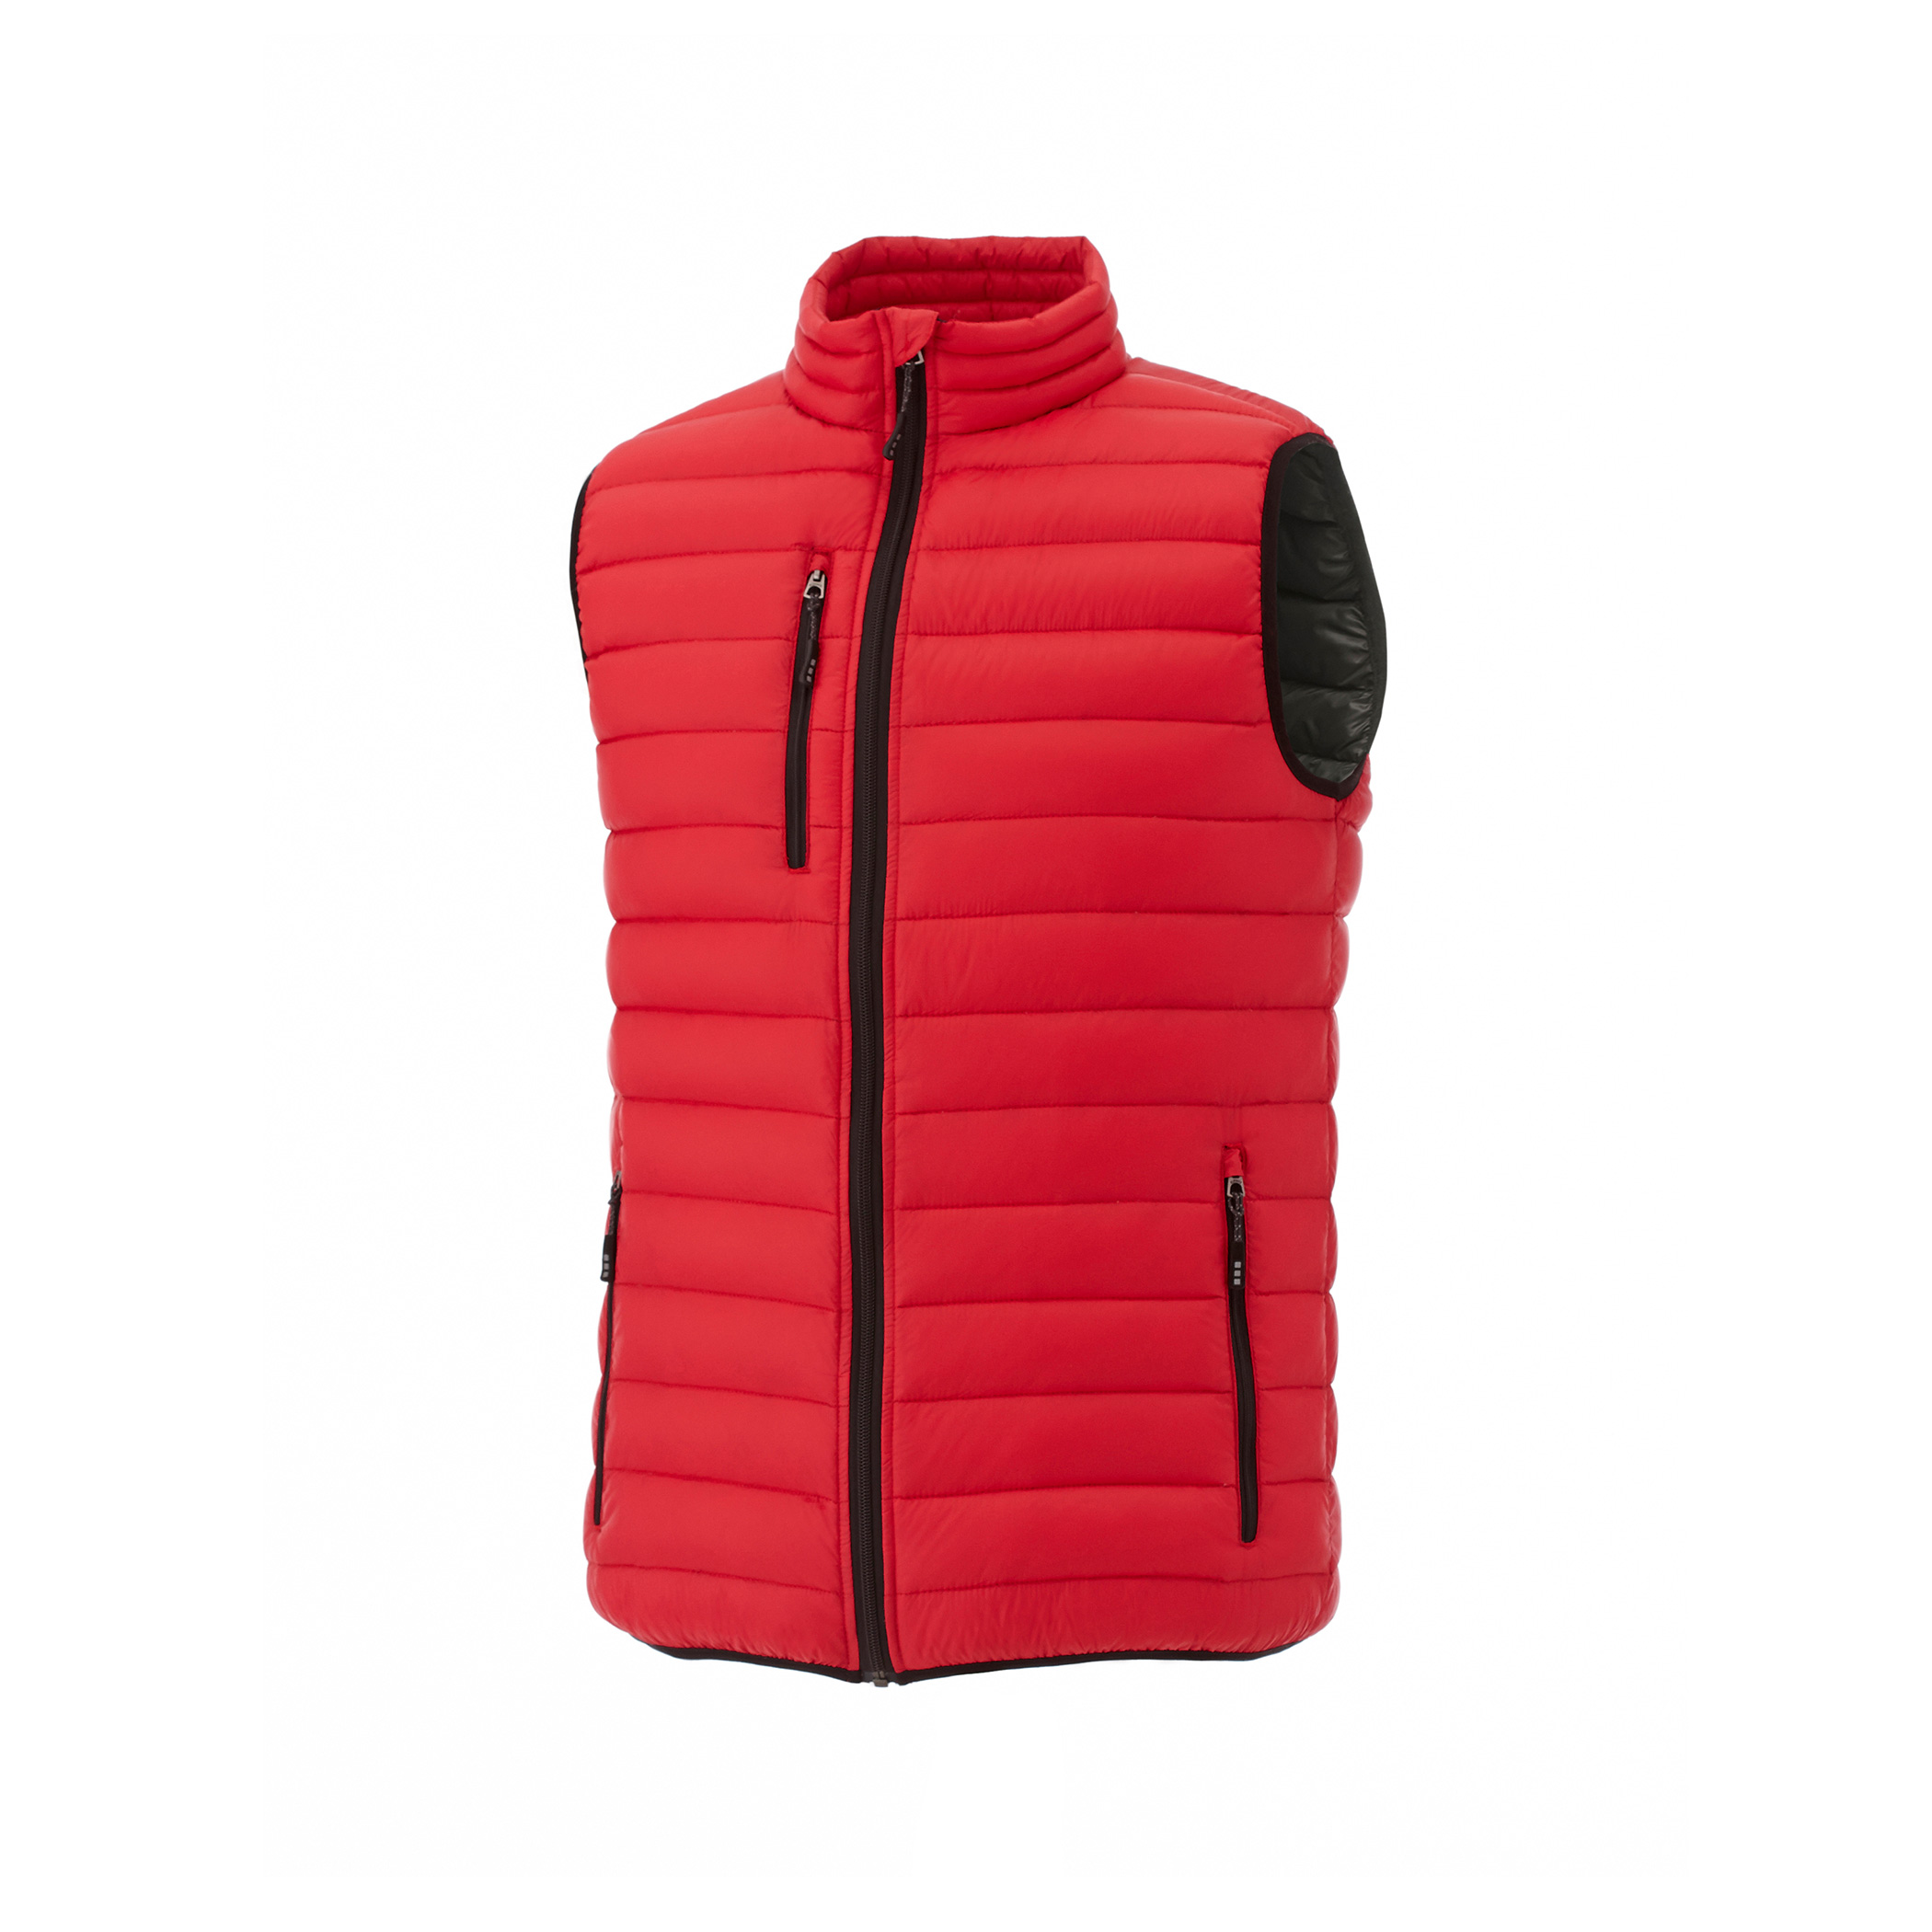 gear jacket jackets journal winter most the s technical softshell ferrari men